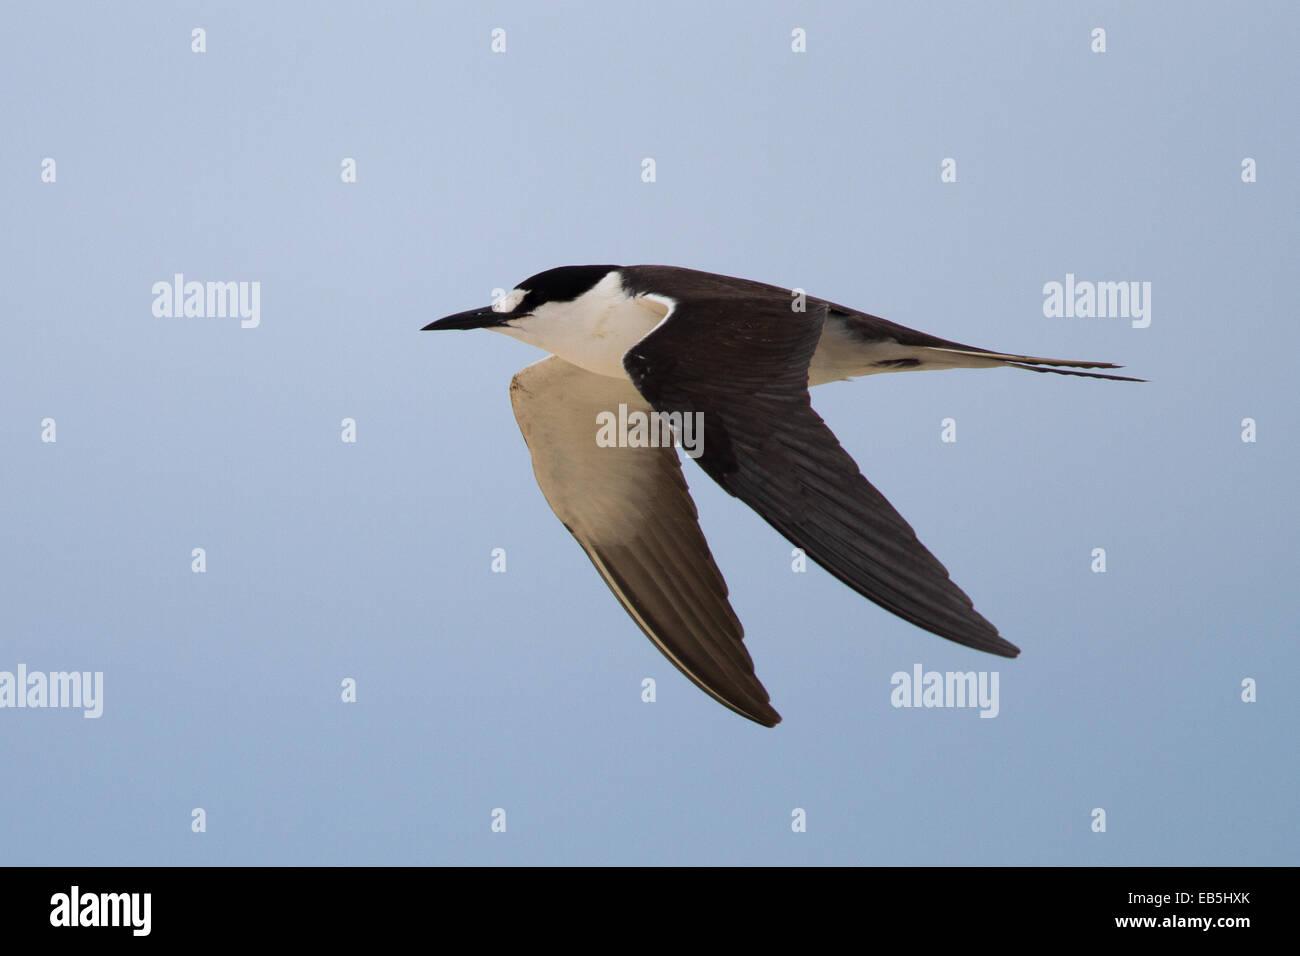 Sooty Tern (Sterna fuscata) - adult in flight Stock Photo